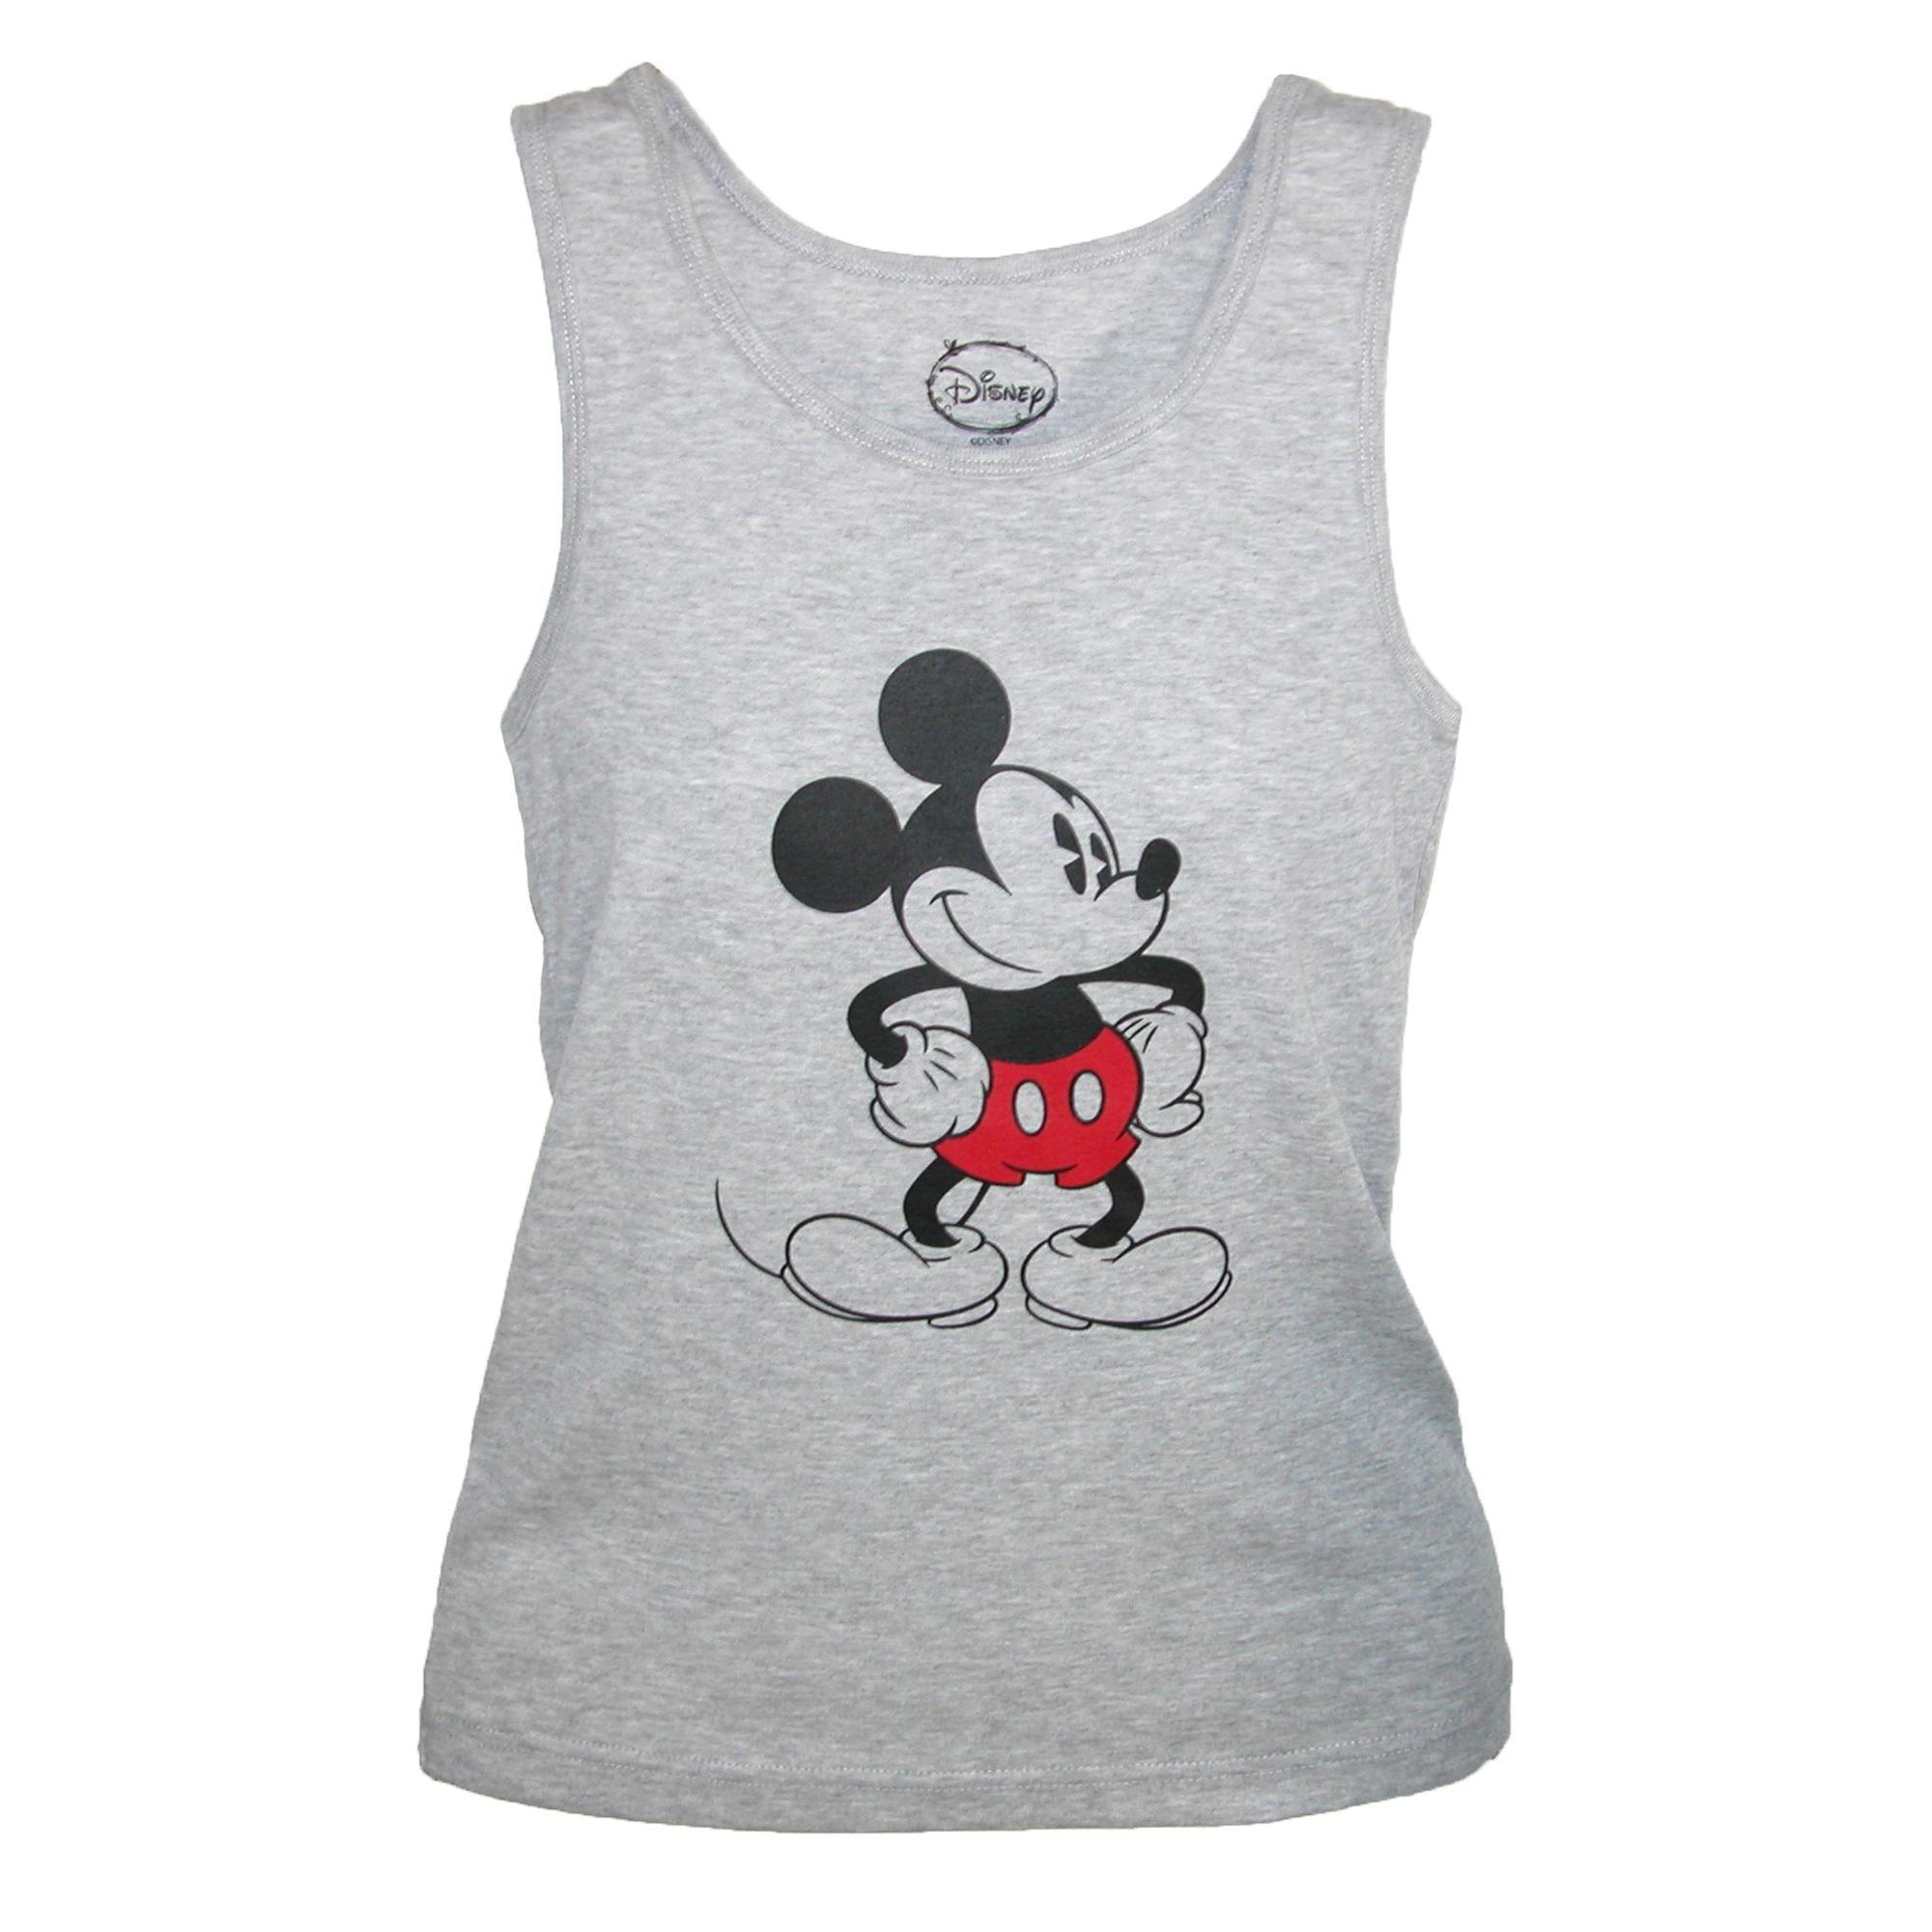 Disney Mickey Mouse Tank Top, Large, Grey